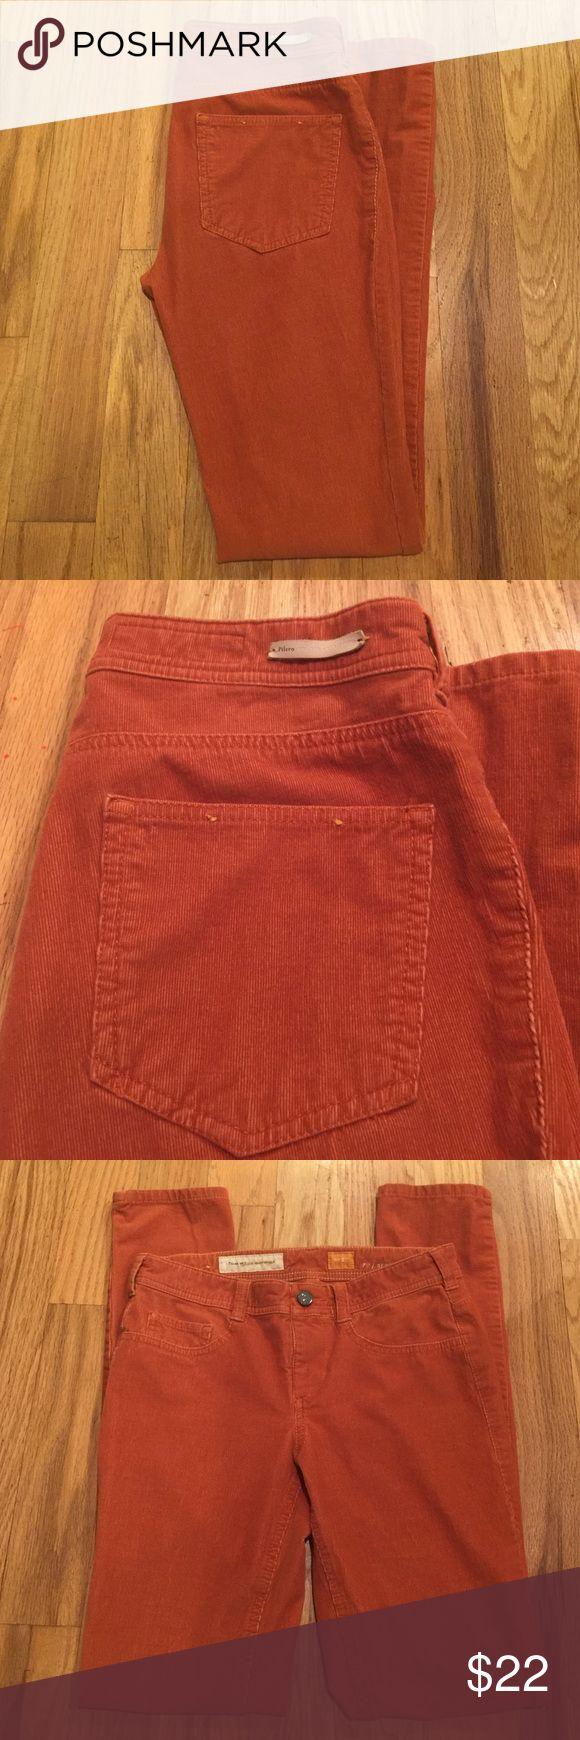 "Pilcro Corduroy Leggings Ladies Pilcro ""Serif"" cord leggings. Size 27. Inseam 30"". Cotton 97% spandex 3%. Pilcro Pants Leggings"